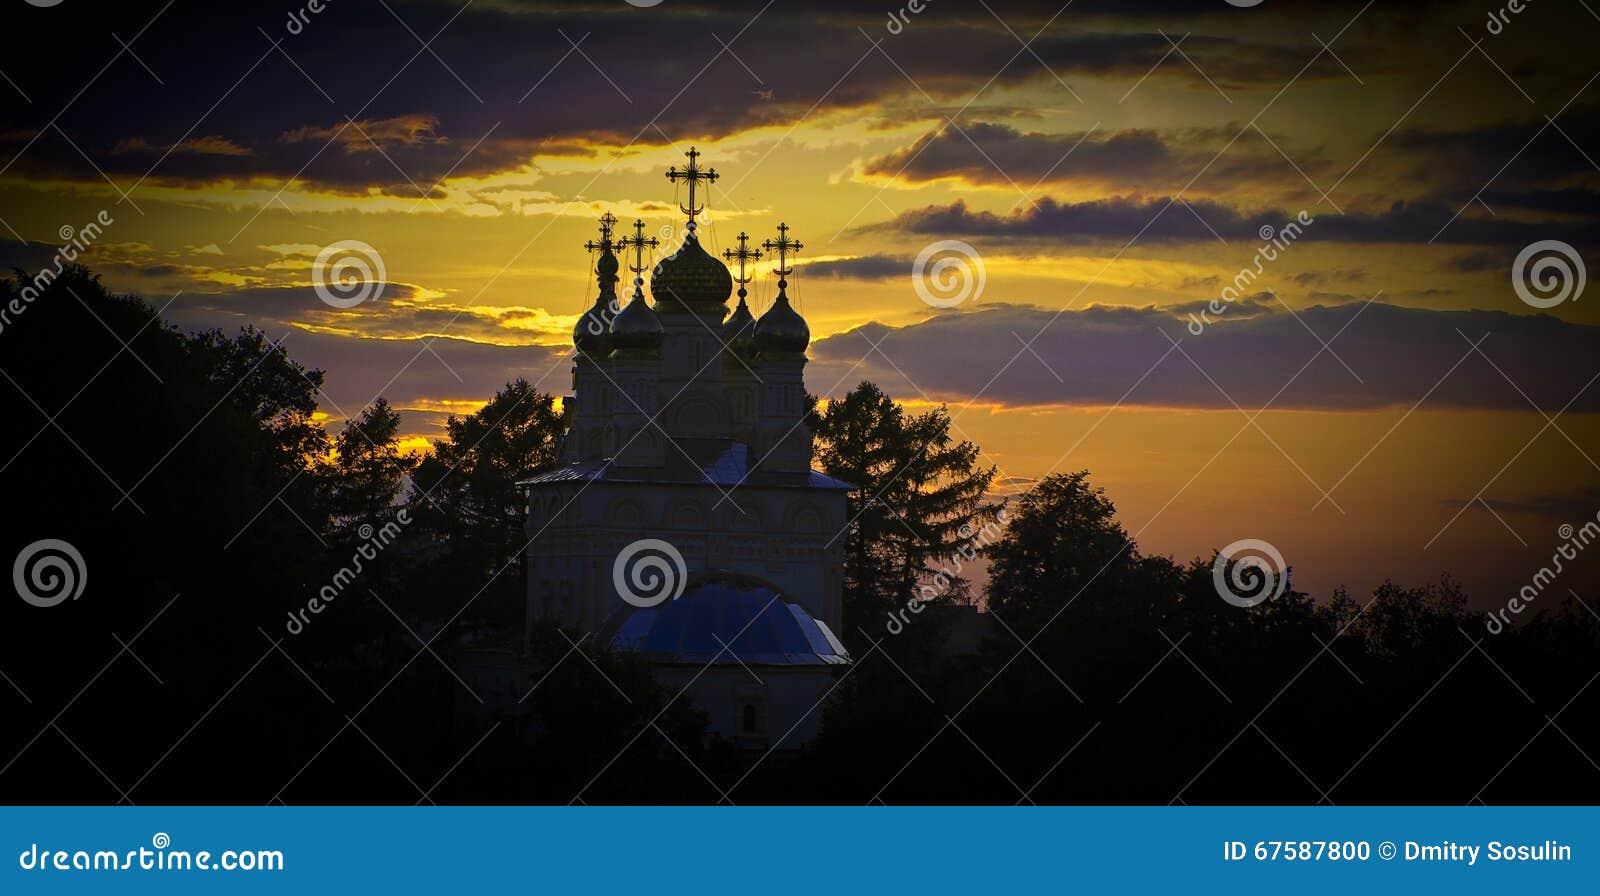 Ryazan church